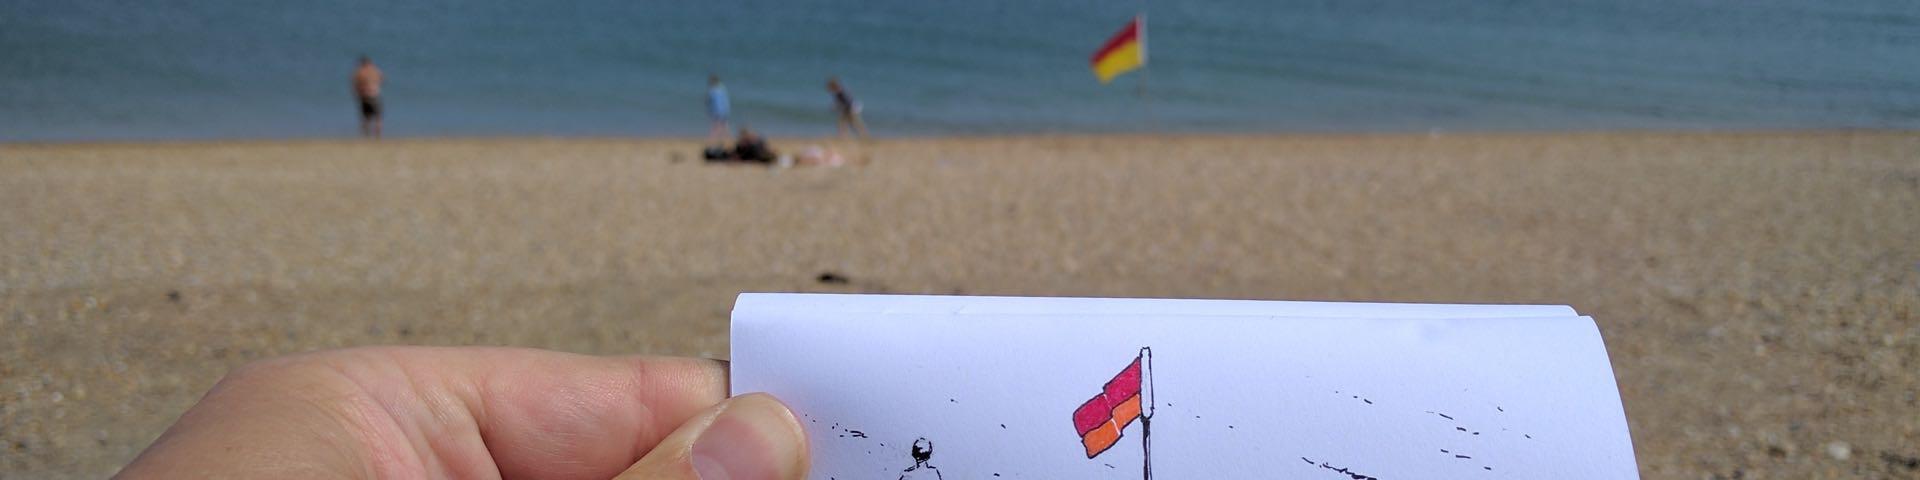 Lifeguard flag featured